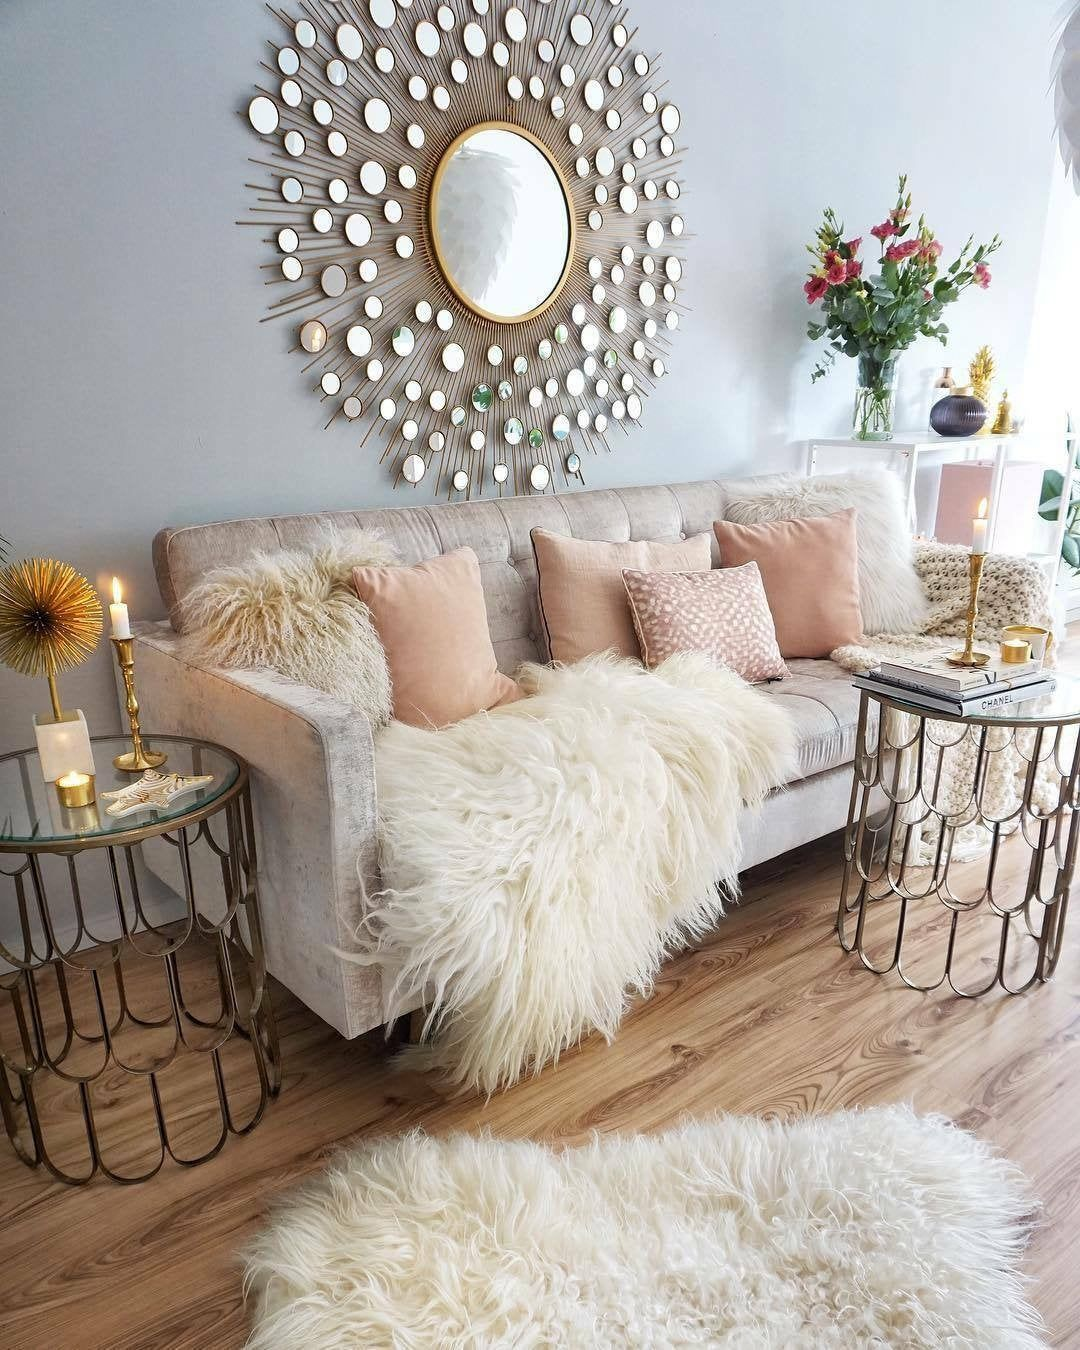 Mongolian Sheepskin Rug Genuine Curly Icelandic Long Wool Cream White Ivory In 2021 Living Room Decor 2018 Glam Living Room Living Room Decor Apartment